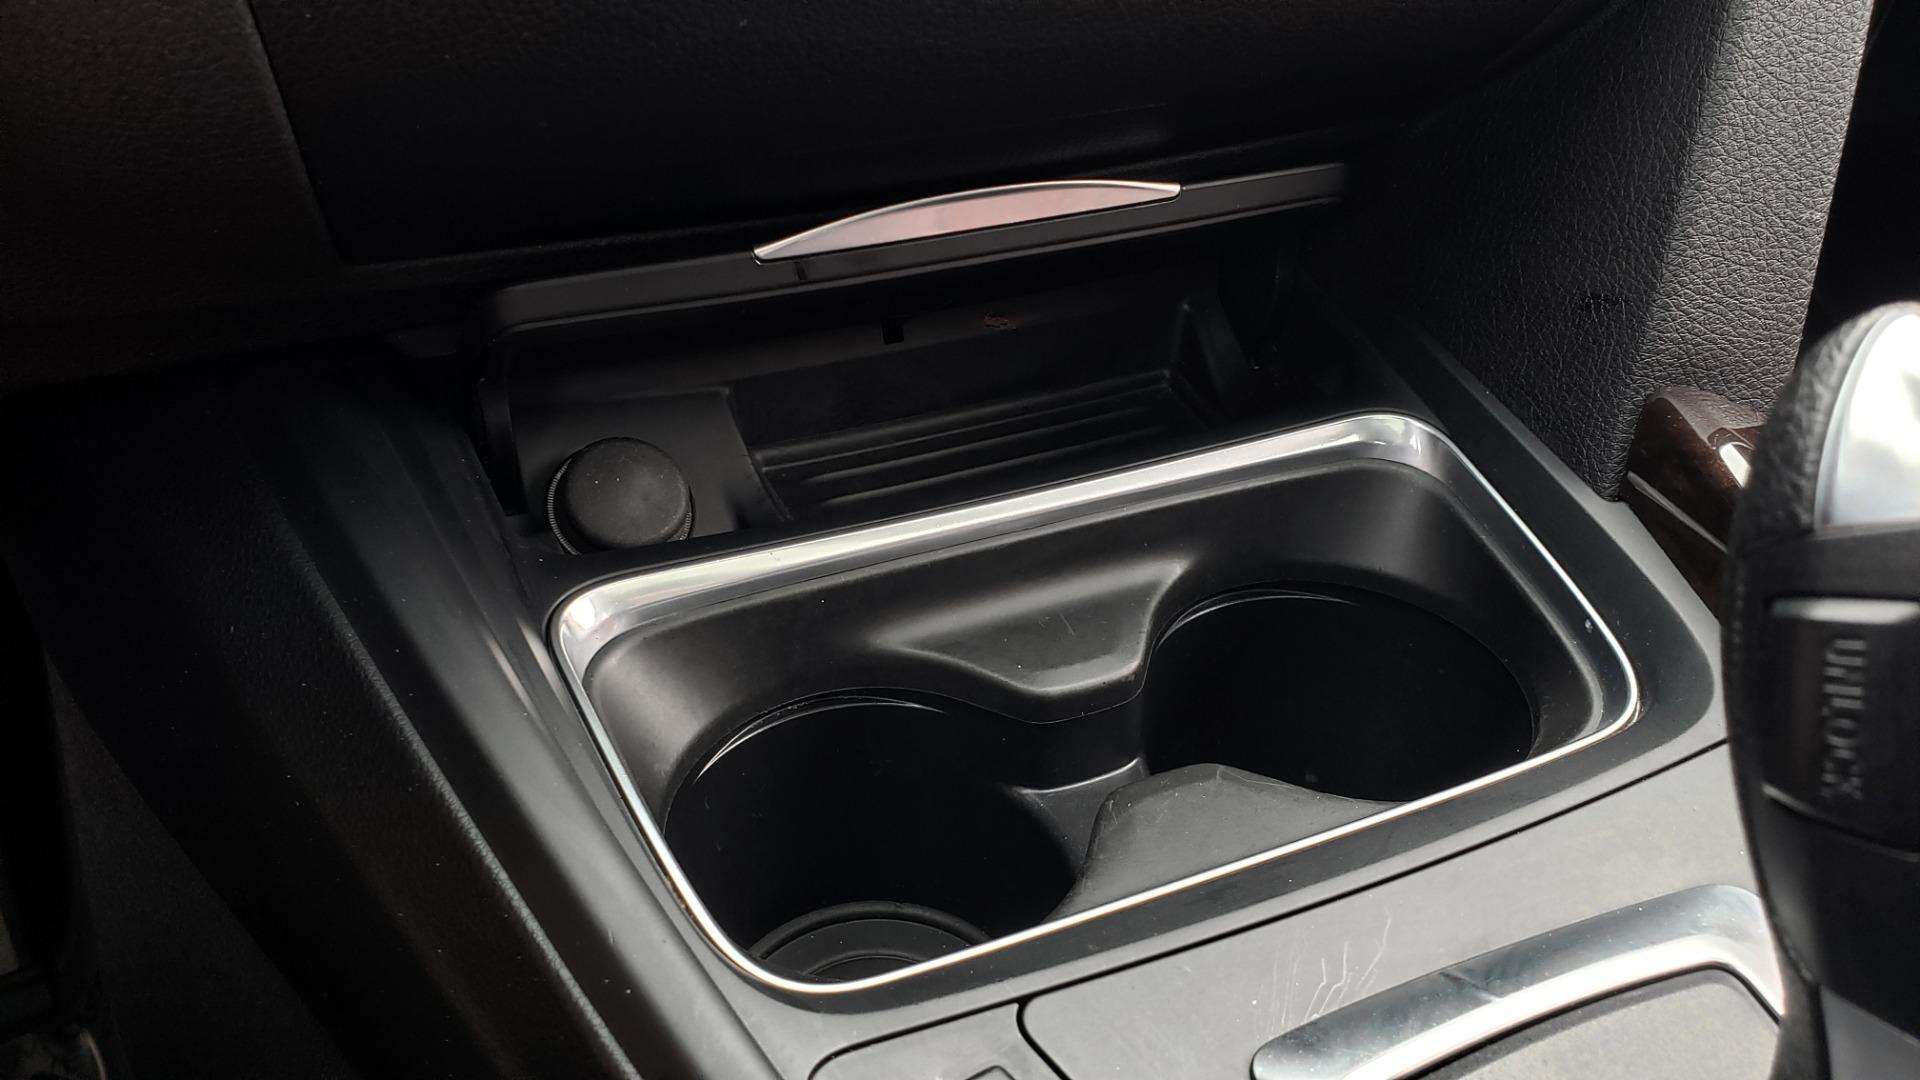 Used 2015 BMW 3 Series 335I M-SPORT / PREM PKG / HK SND / SUNROOF / REARVIEW for sale Sold at Formula Imports in Charlotte NC 28227 51